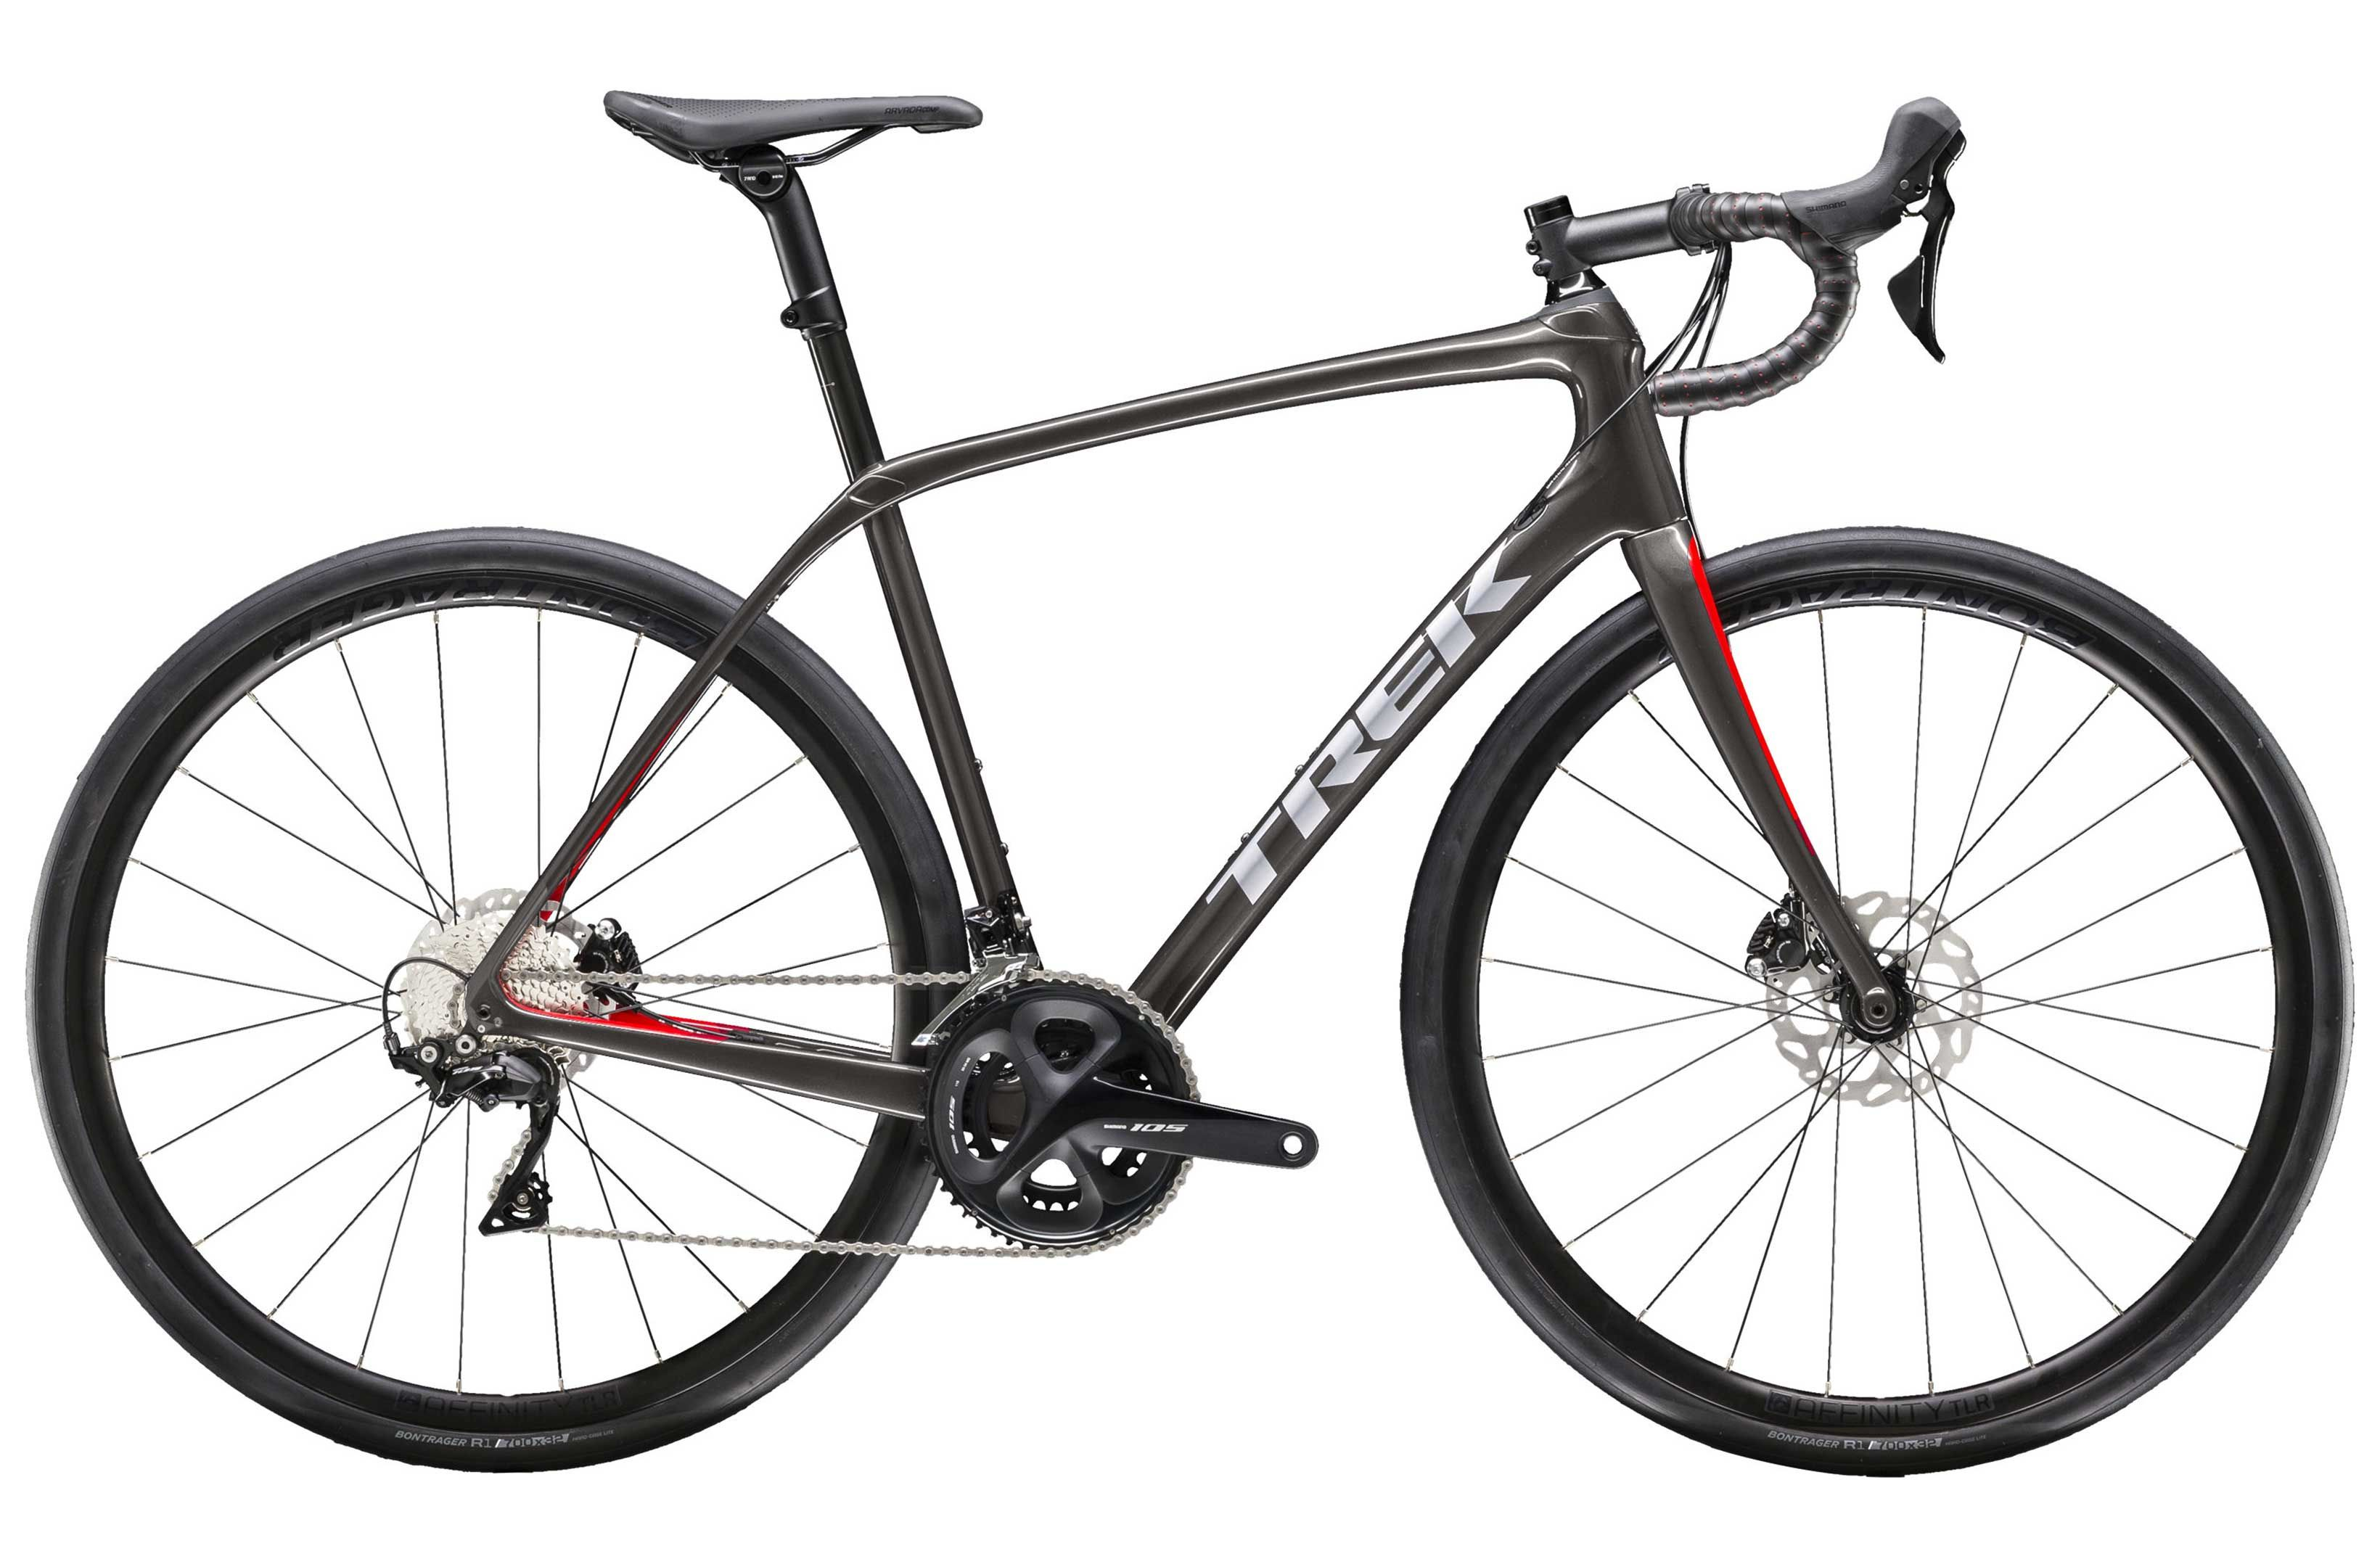 Trek Domane Sl 5 Disc 2019 Road Bike